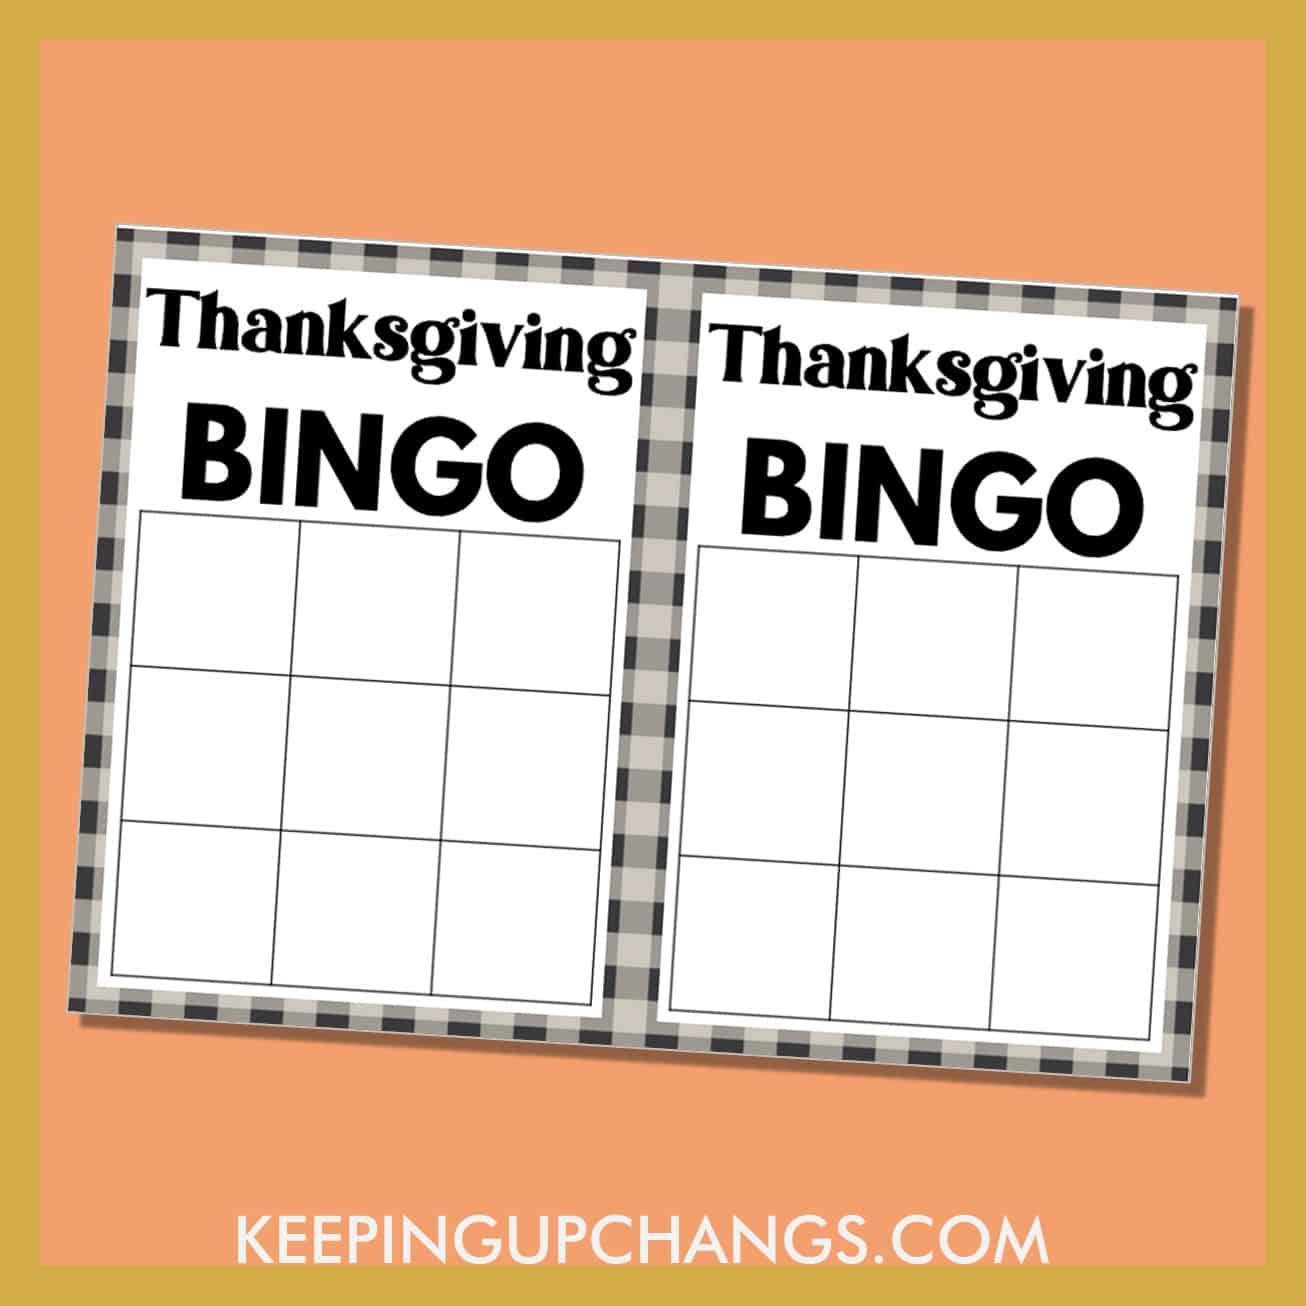 free thanksgiving bingo 3x3 grid black white game board blank template.